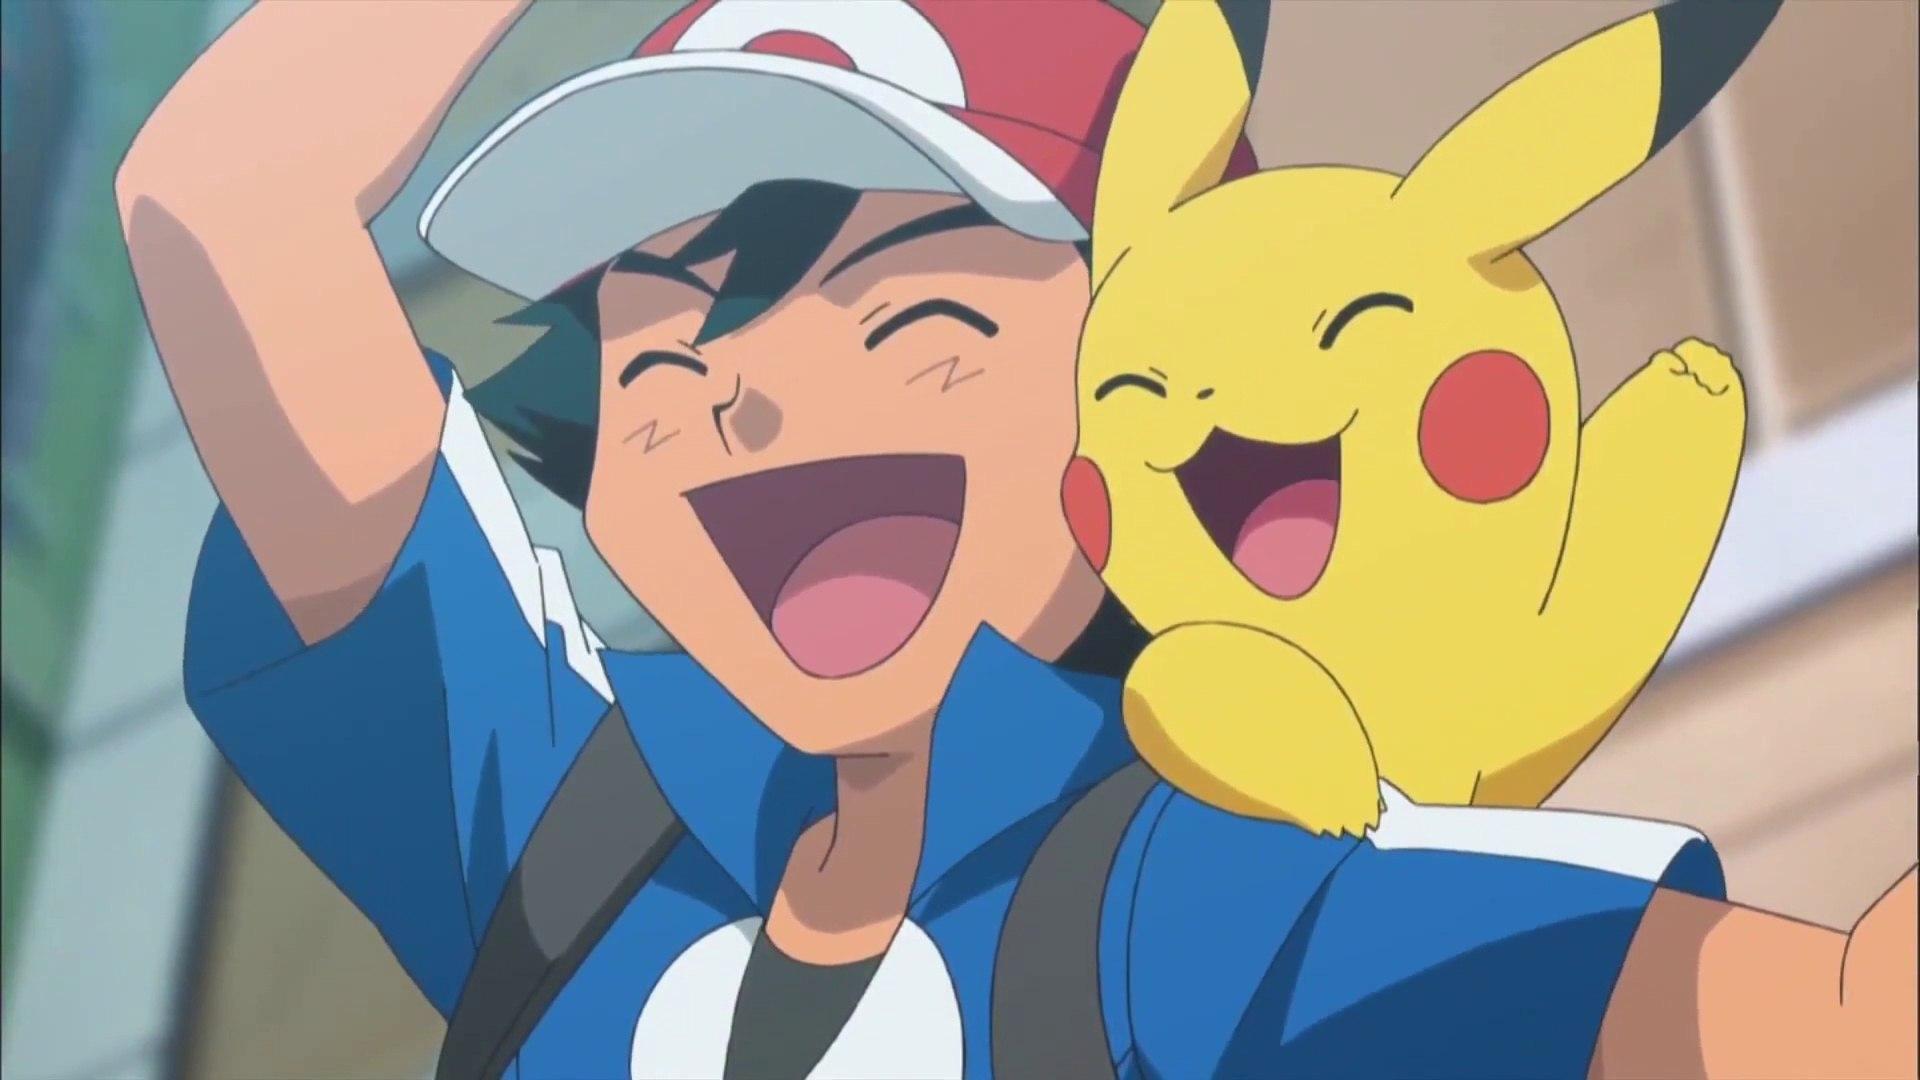 Pokemon XY Episode 1 in Hindi - video Dailymotion